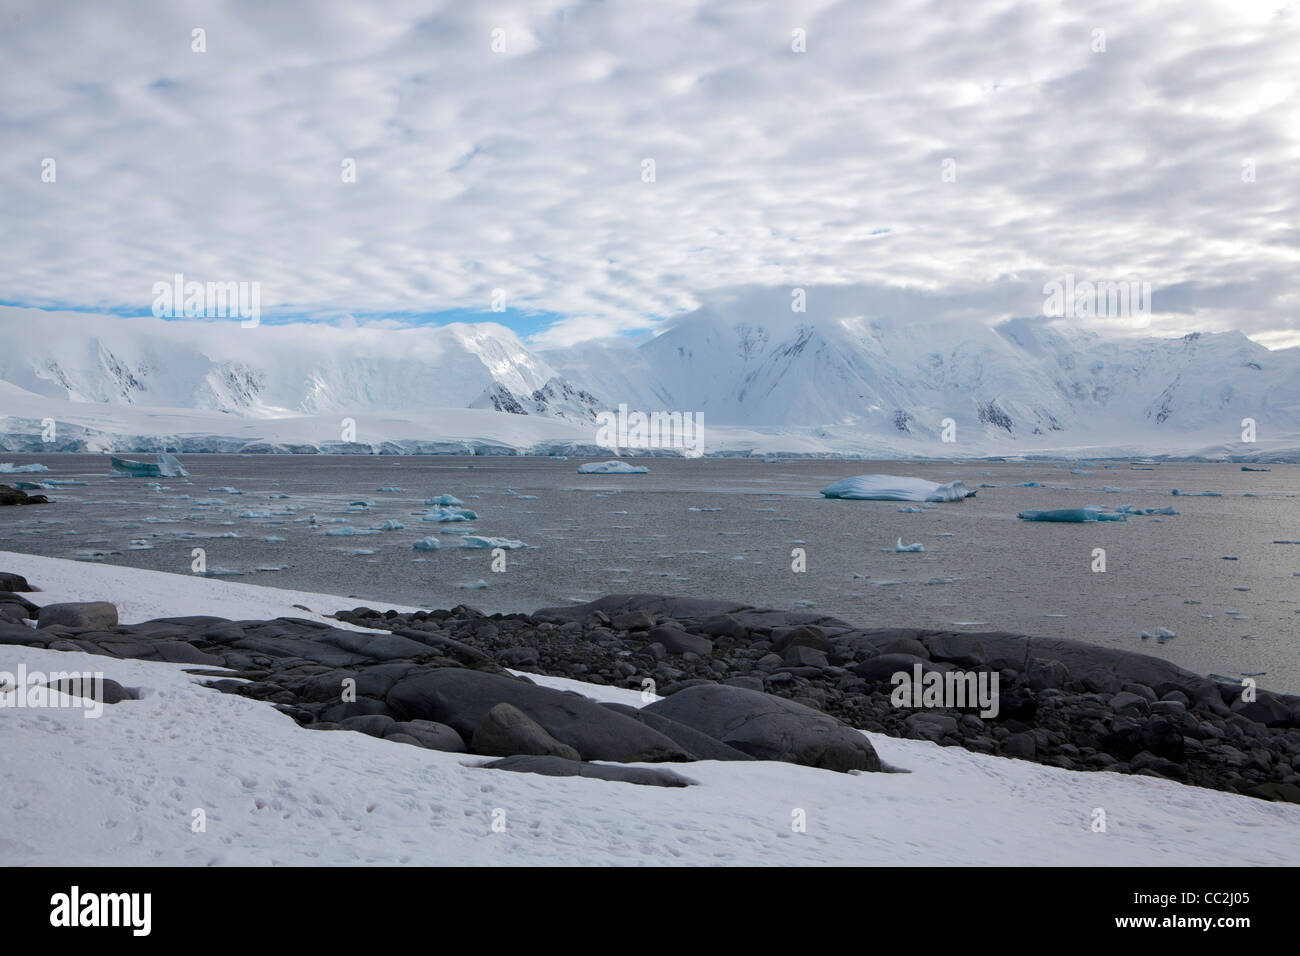 Ice bergs flotter dans la baie Dorian, l'Antarctique Photo Stock